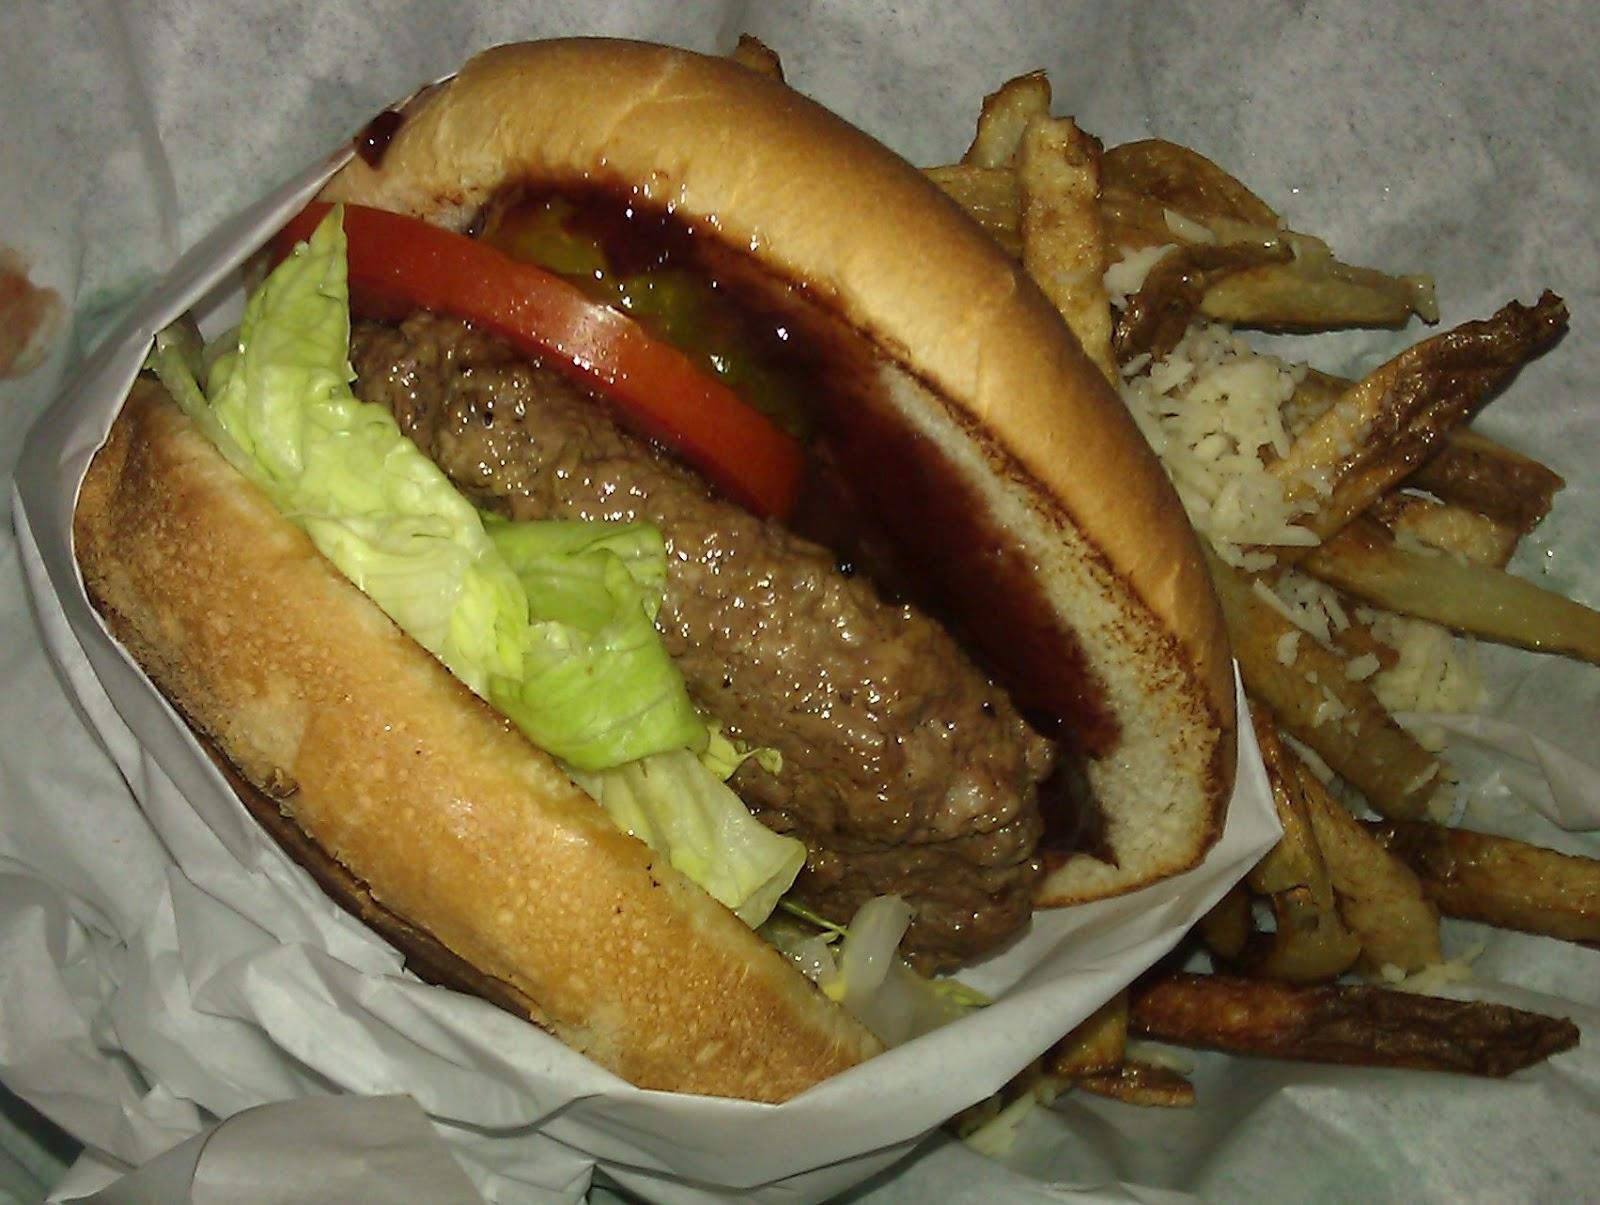 http://2.bp.blogspot.com/-d7WFiaiiaqs/UDq4yWIrxNI/AAAAAAAAB-M/6MMypW-E2Sk/s1600/Patricks+Roadhouse+Dijon+Plum+Burger.jpg